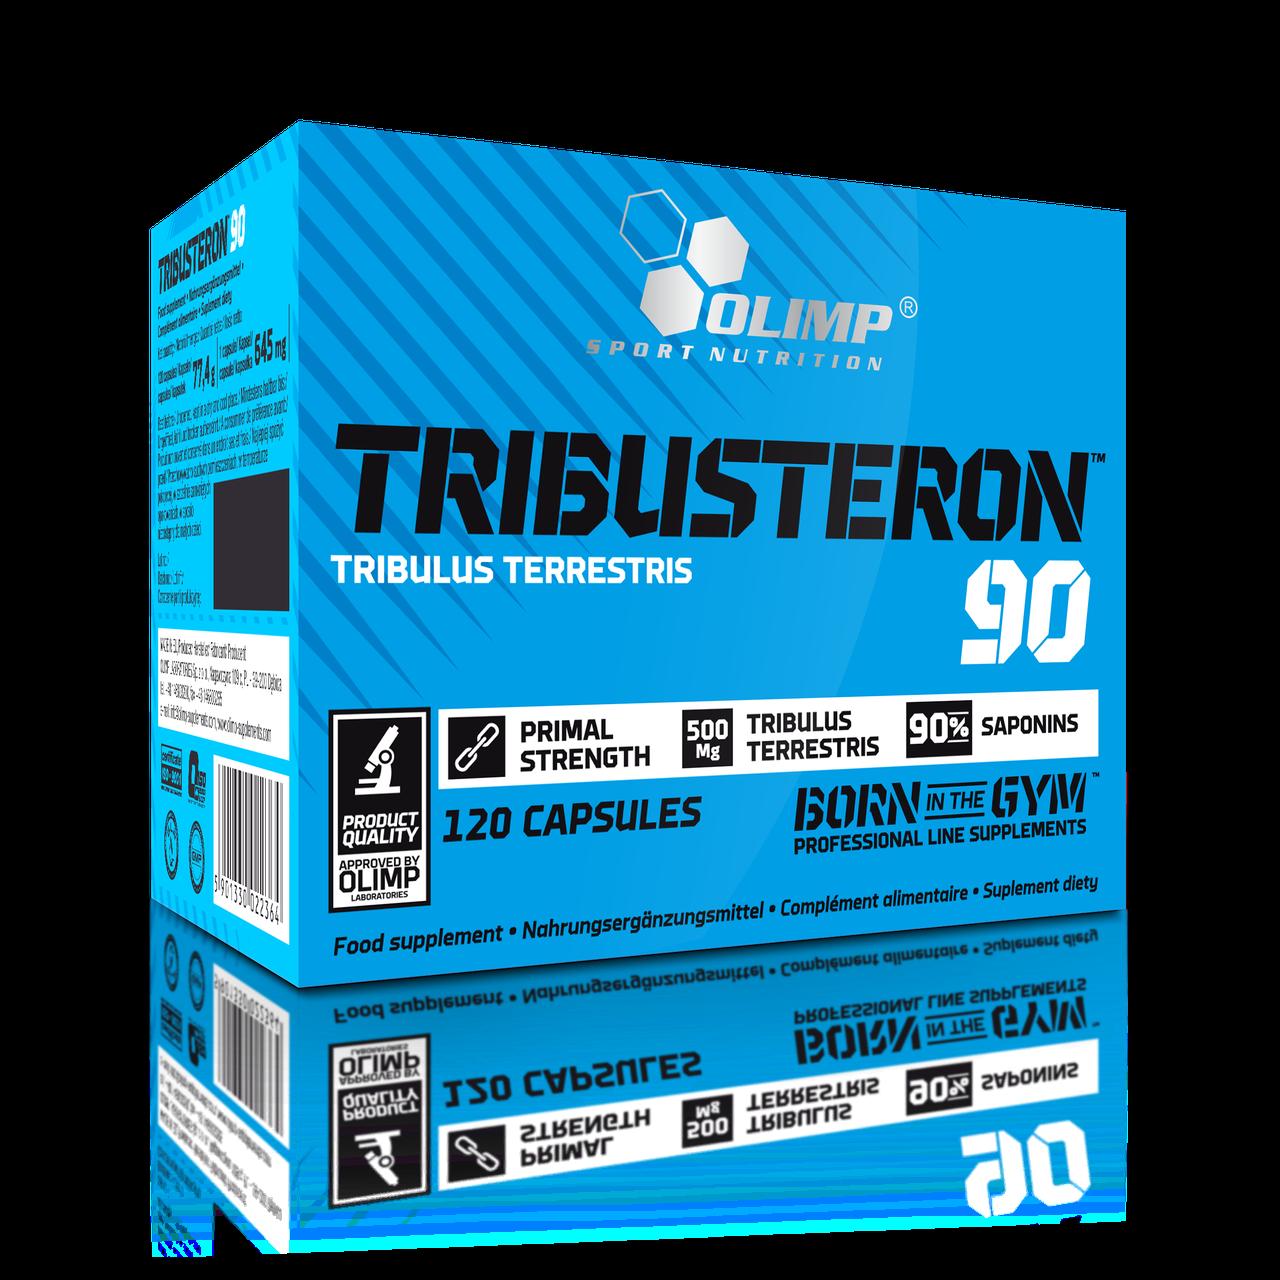 Трибулус террестрис Olimp Sport Nutrition Tribusteron 90 120 caps